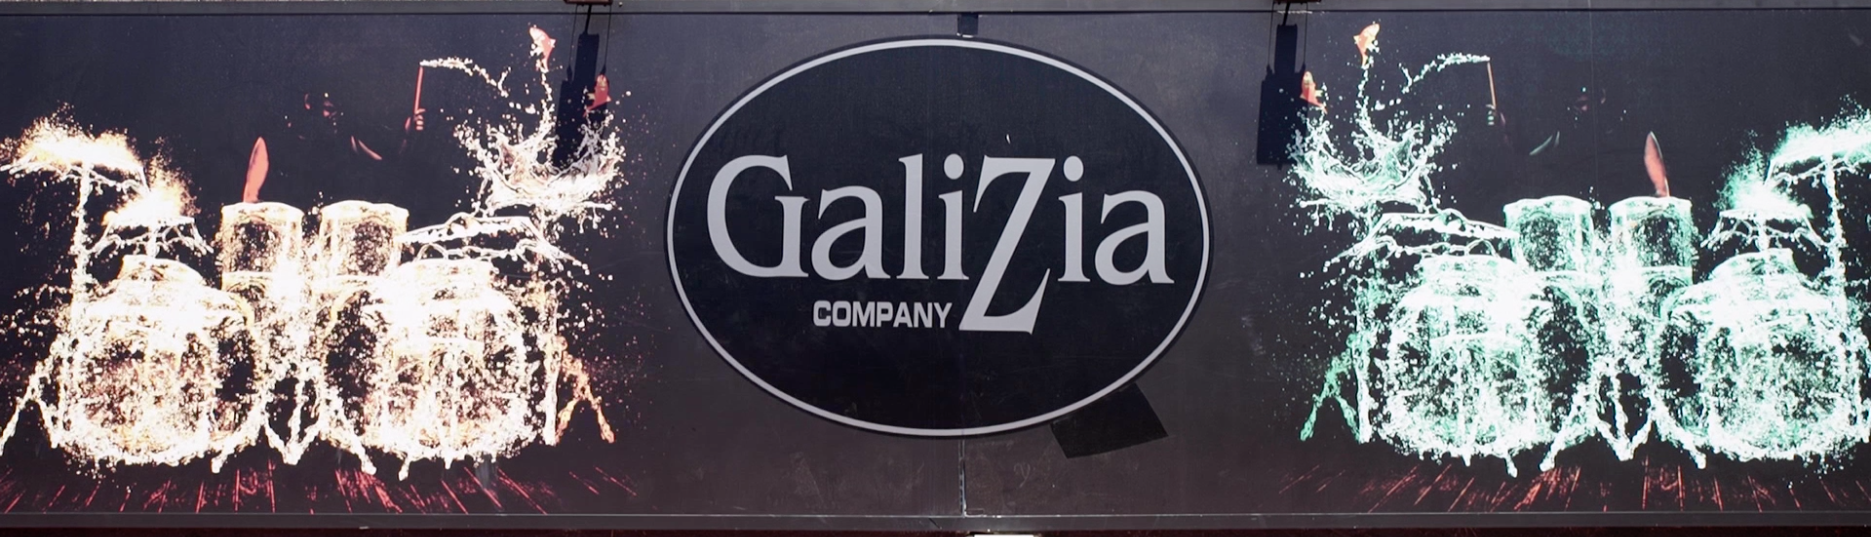 Galizia Company